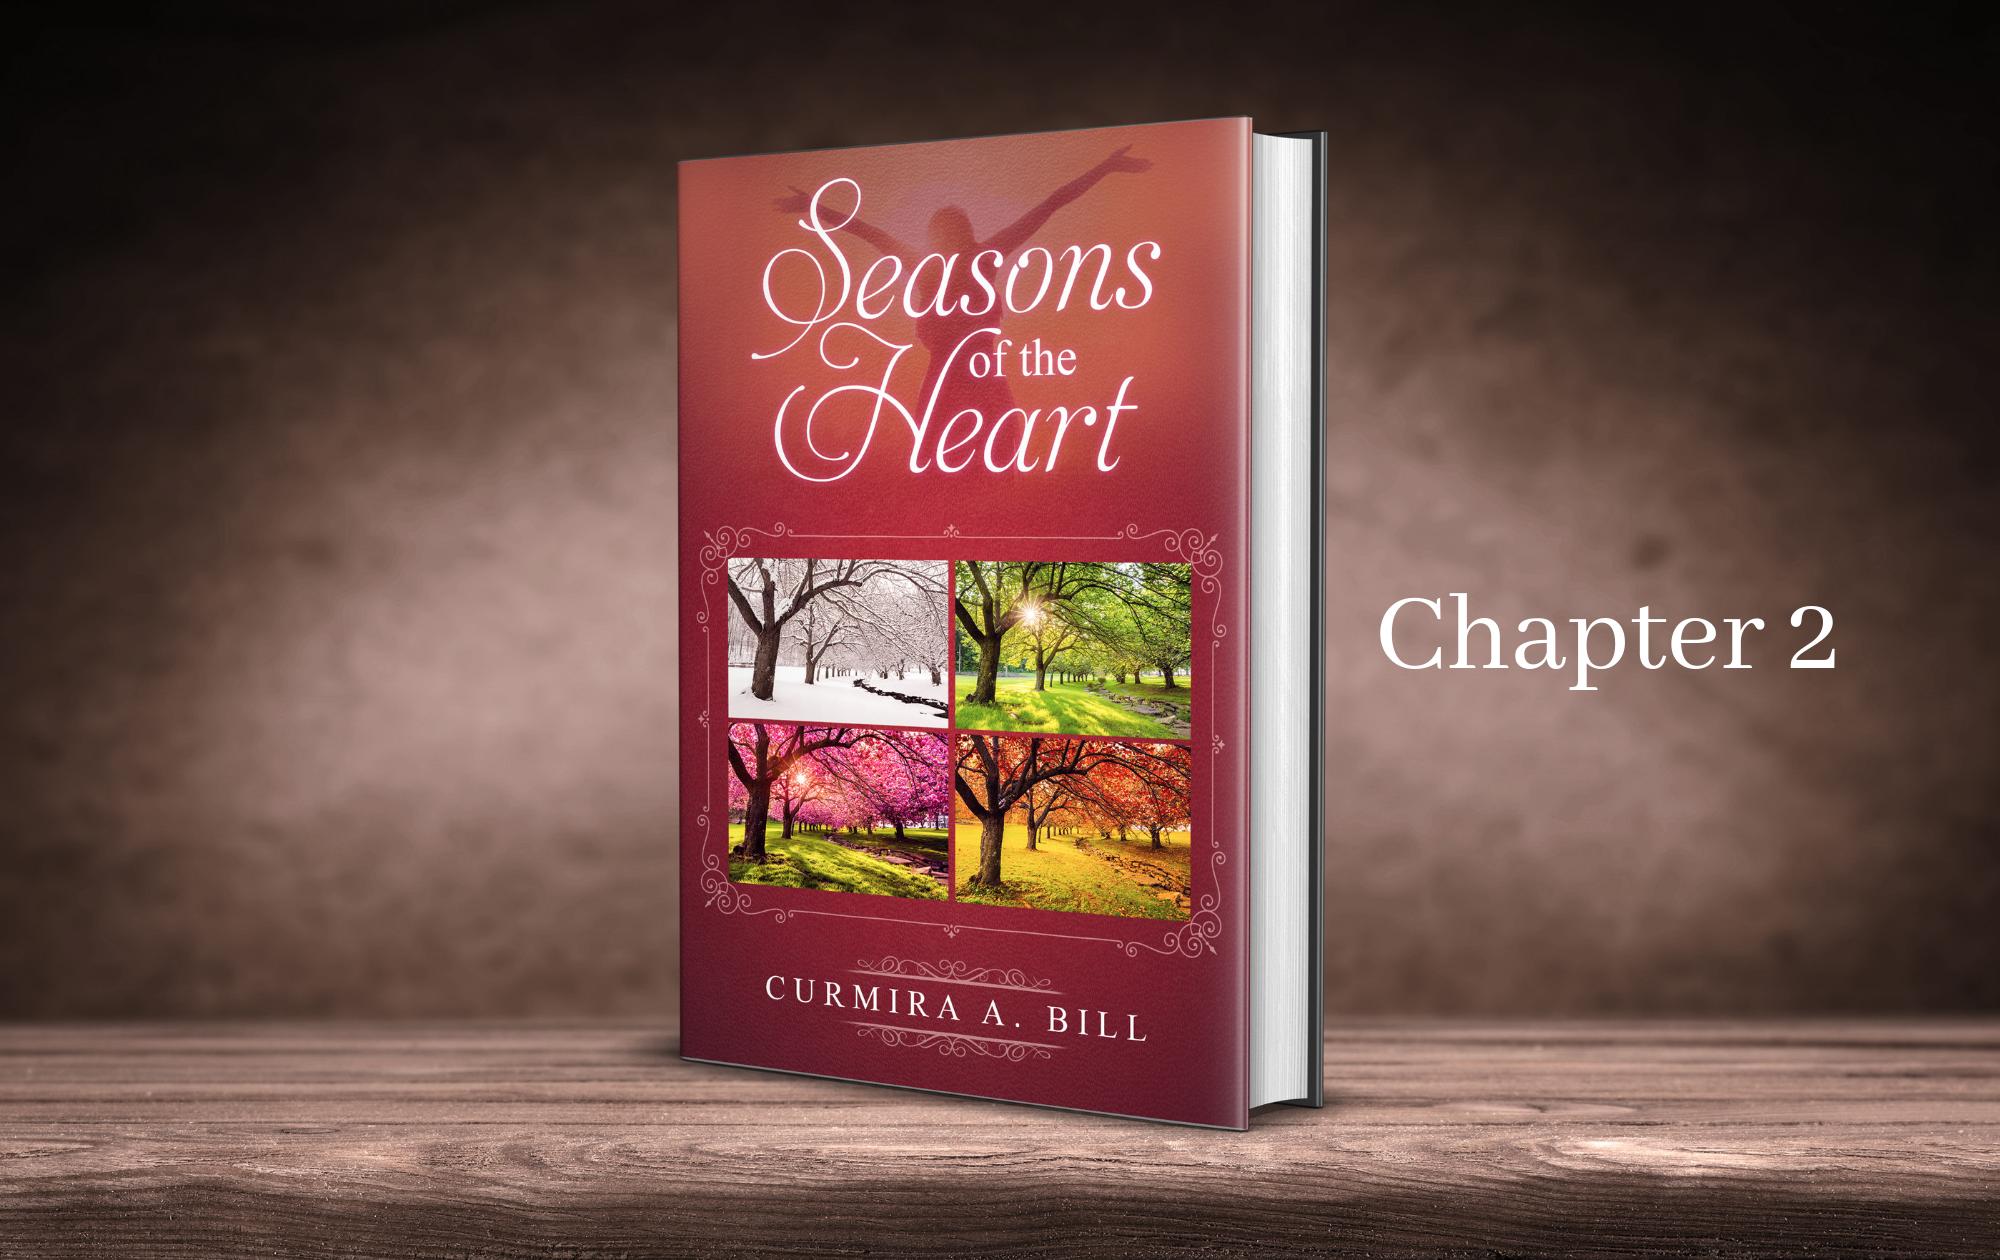 Seasons of the Heart 2, oN akvn